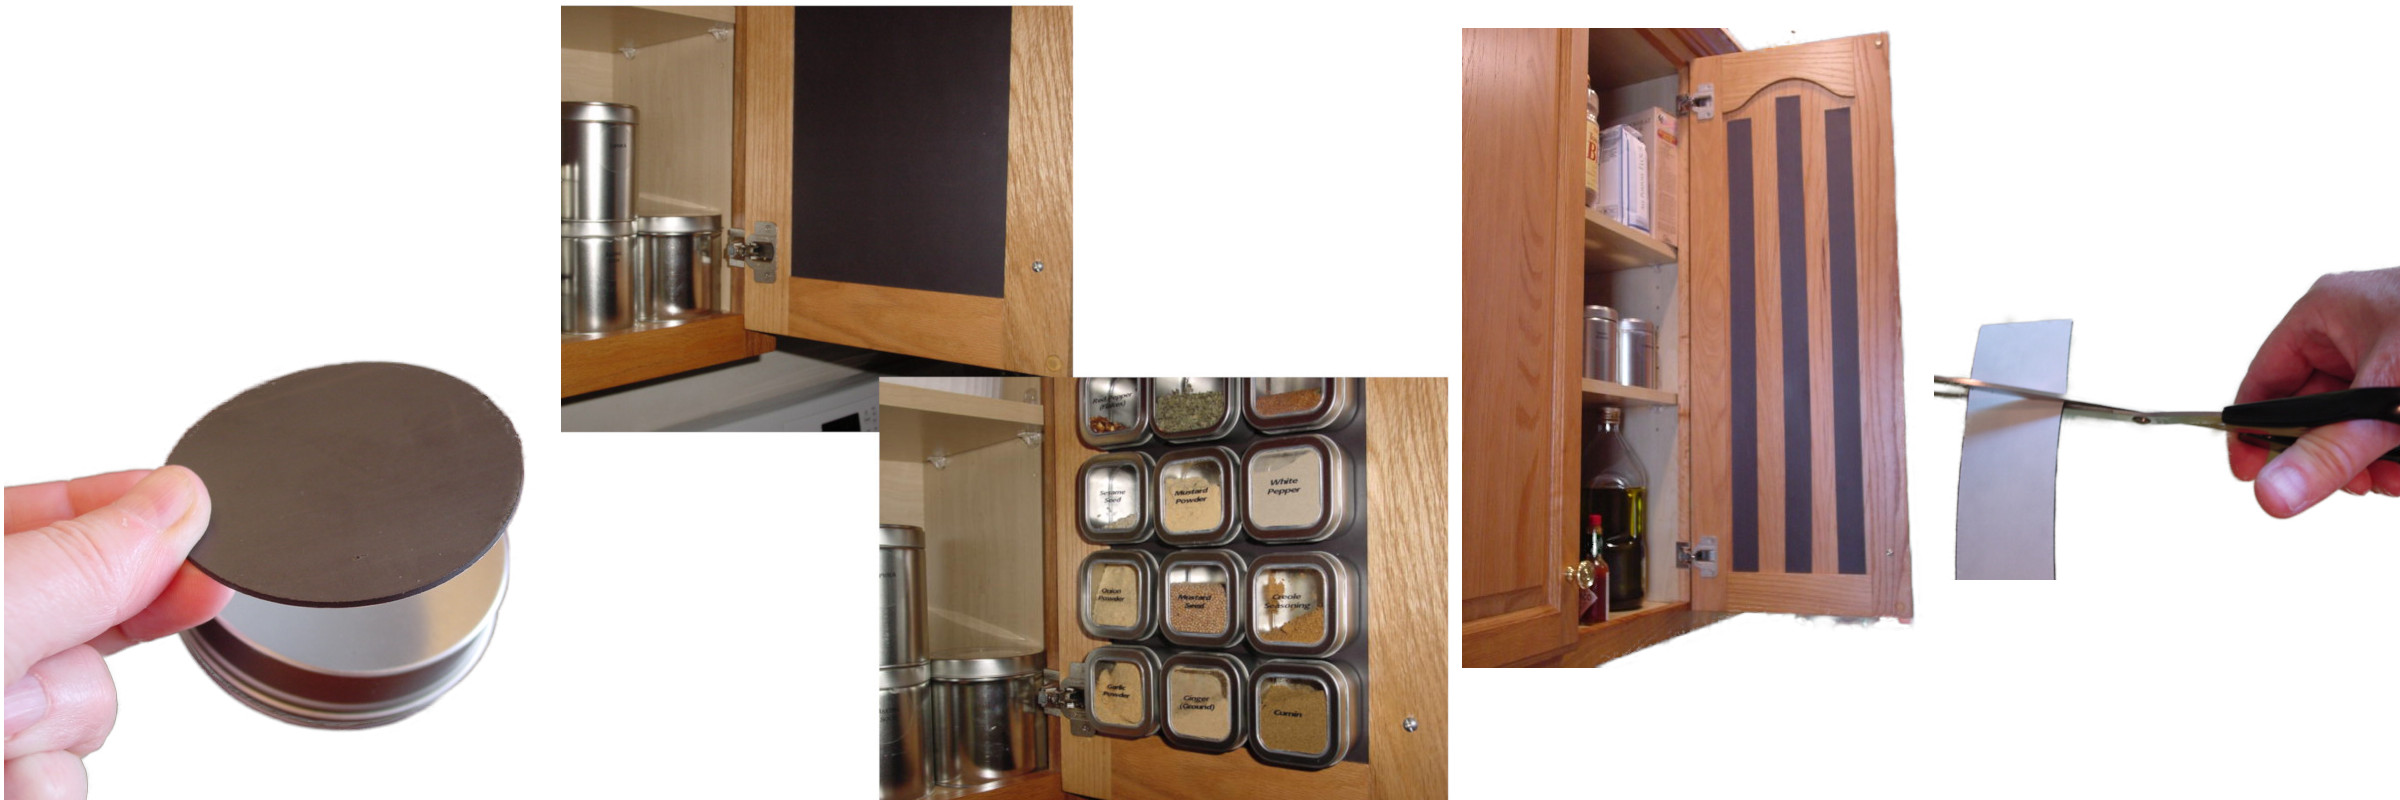 Versatile Flexible Magnet - Customize your Spice Storage